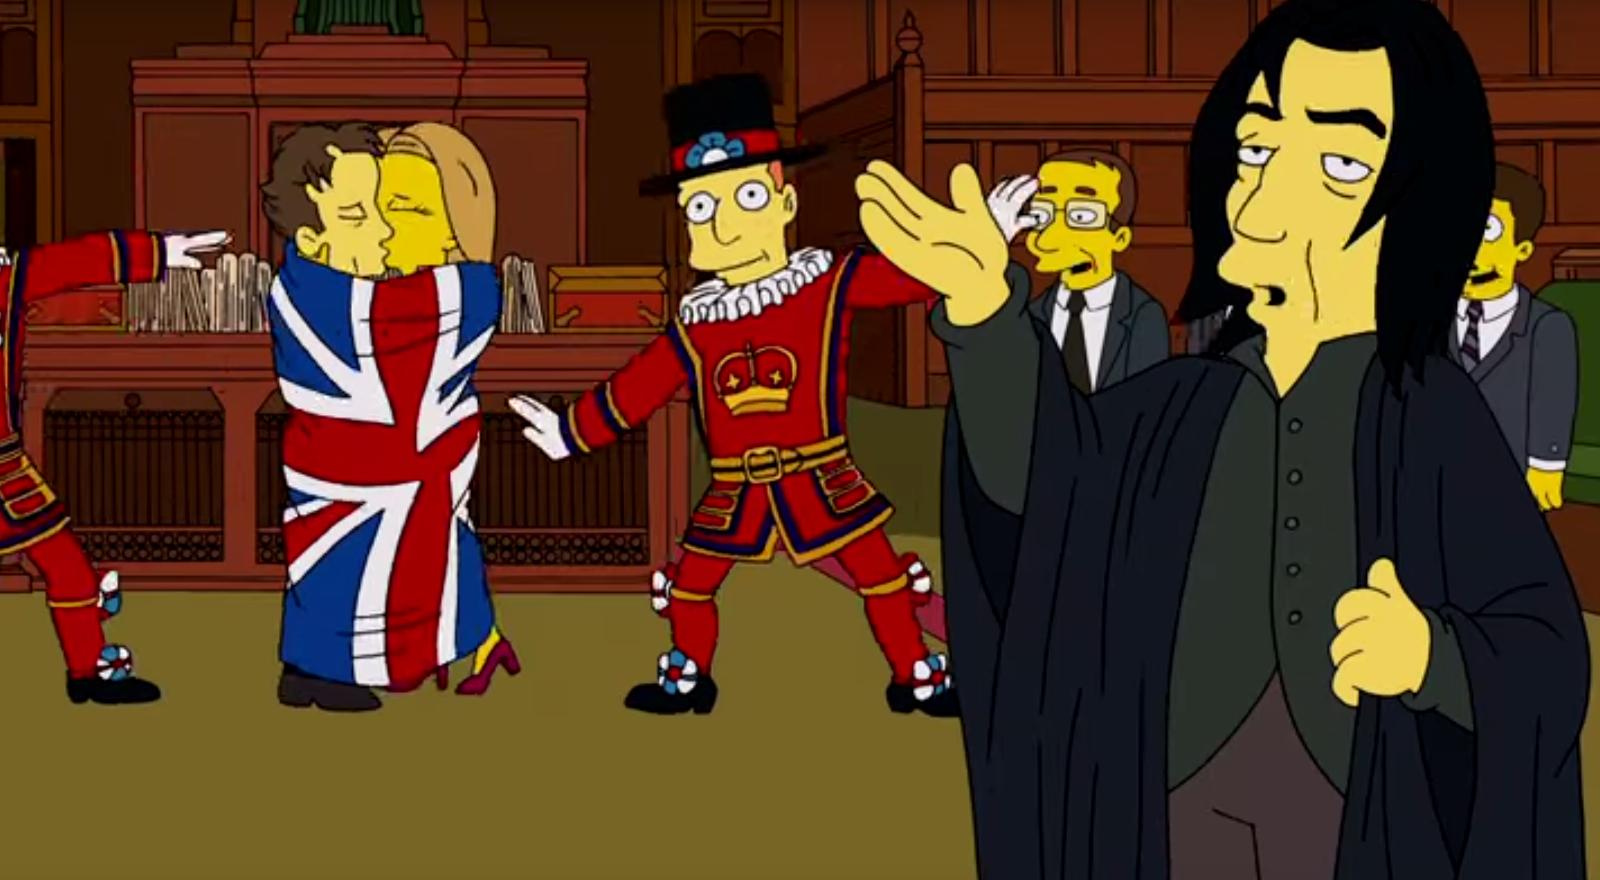 Alan Rickman als Severus Snape in einer Simpsons-Folge